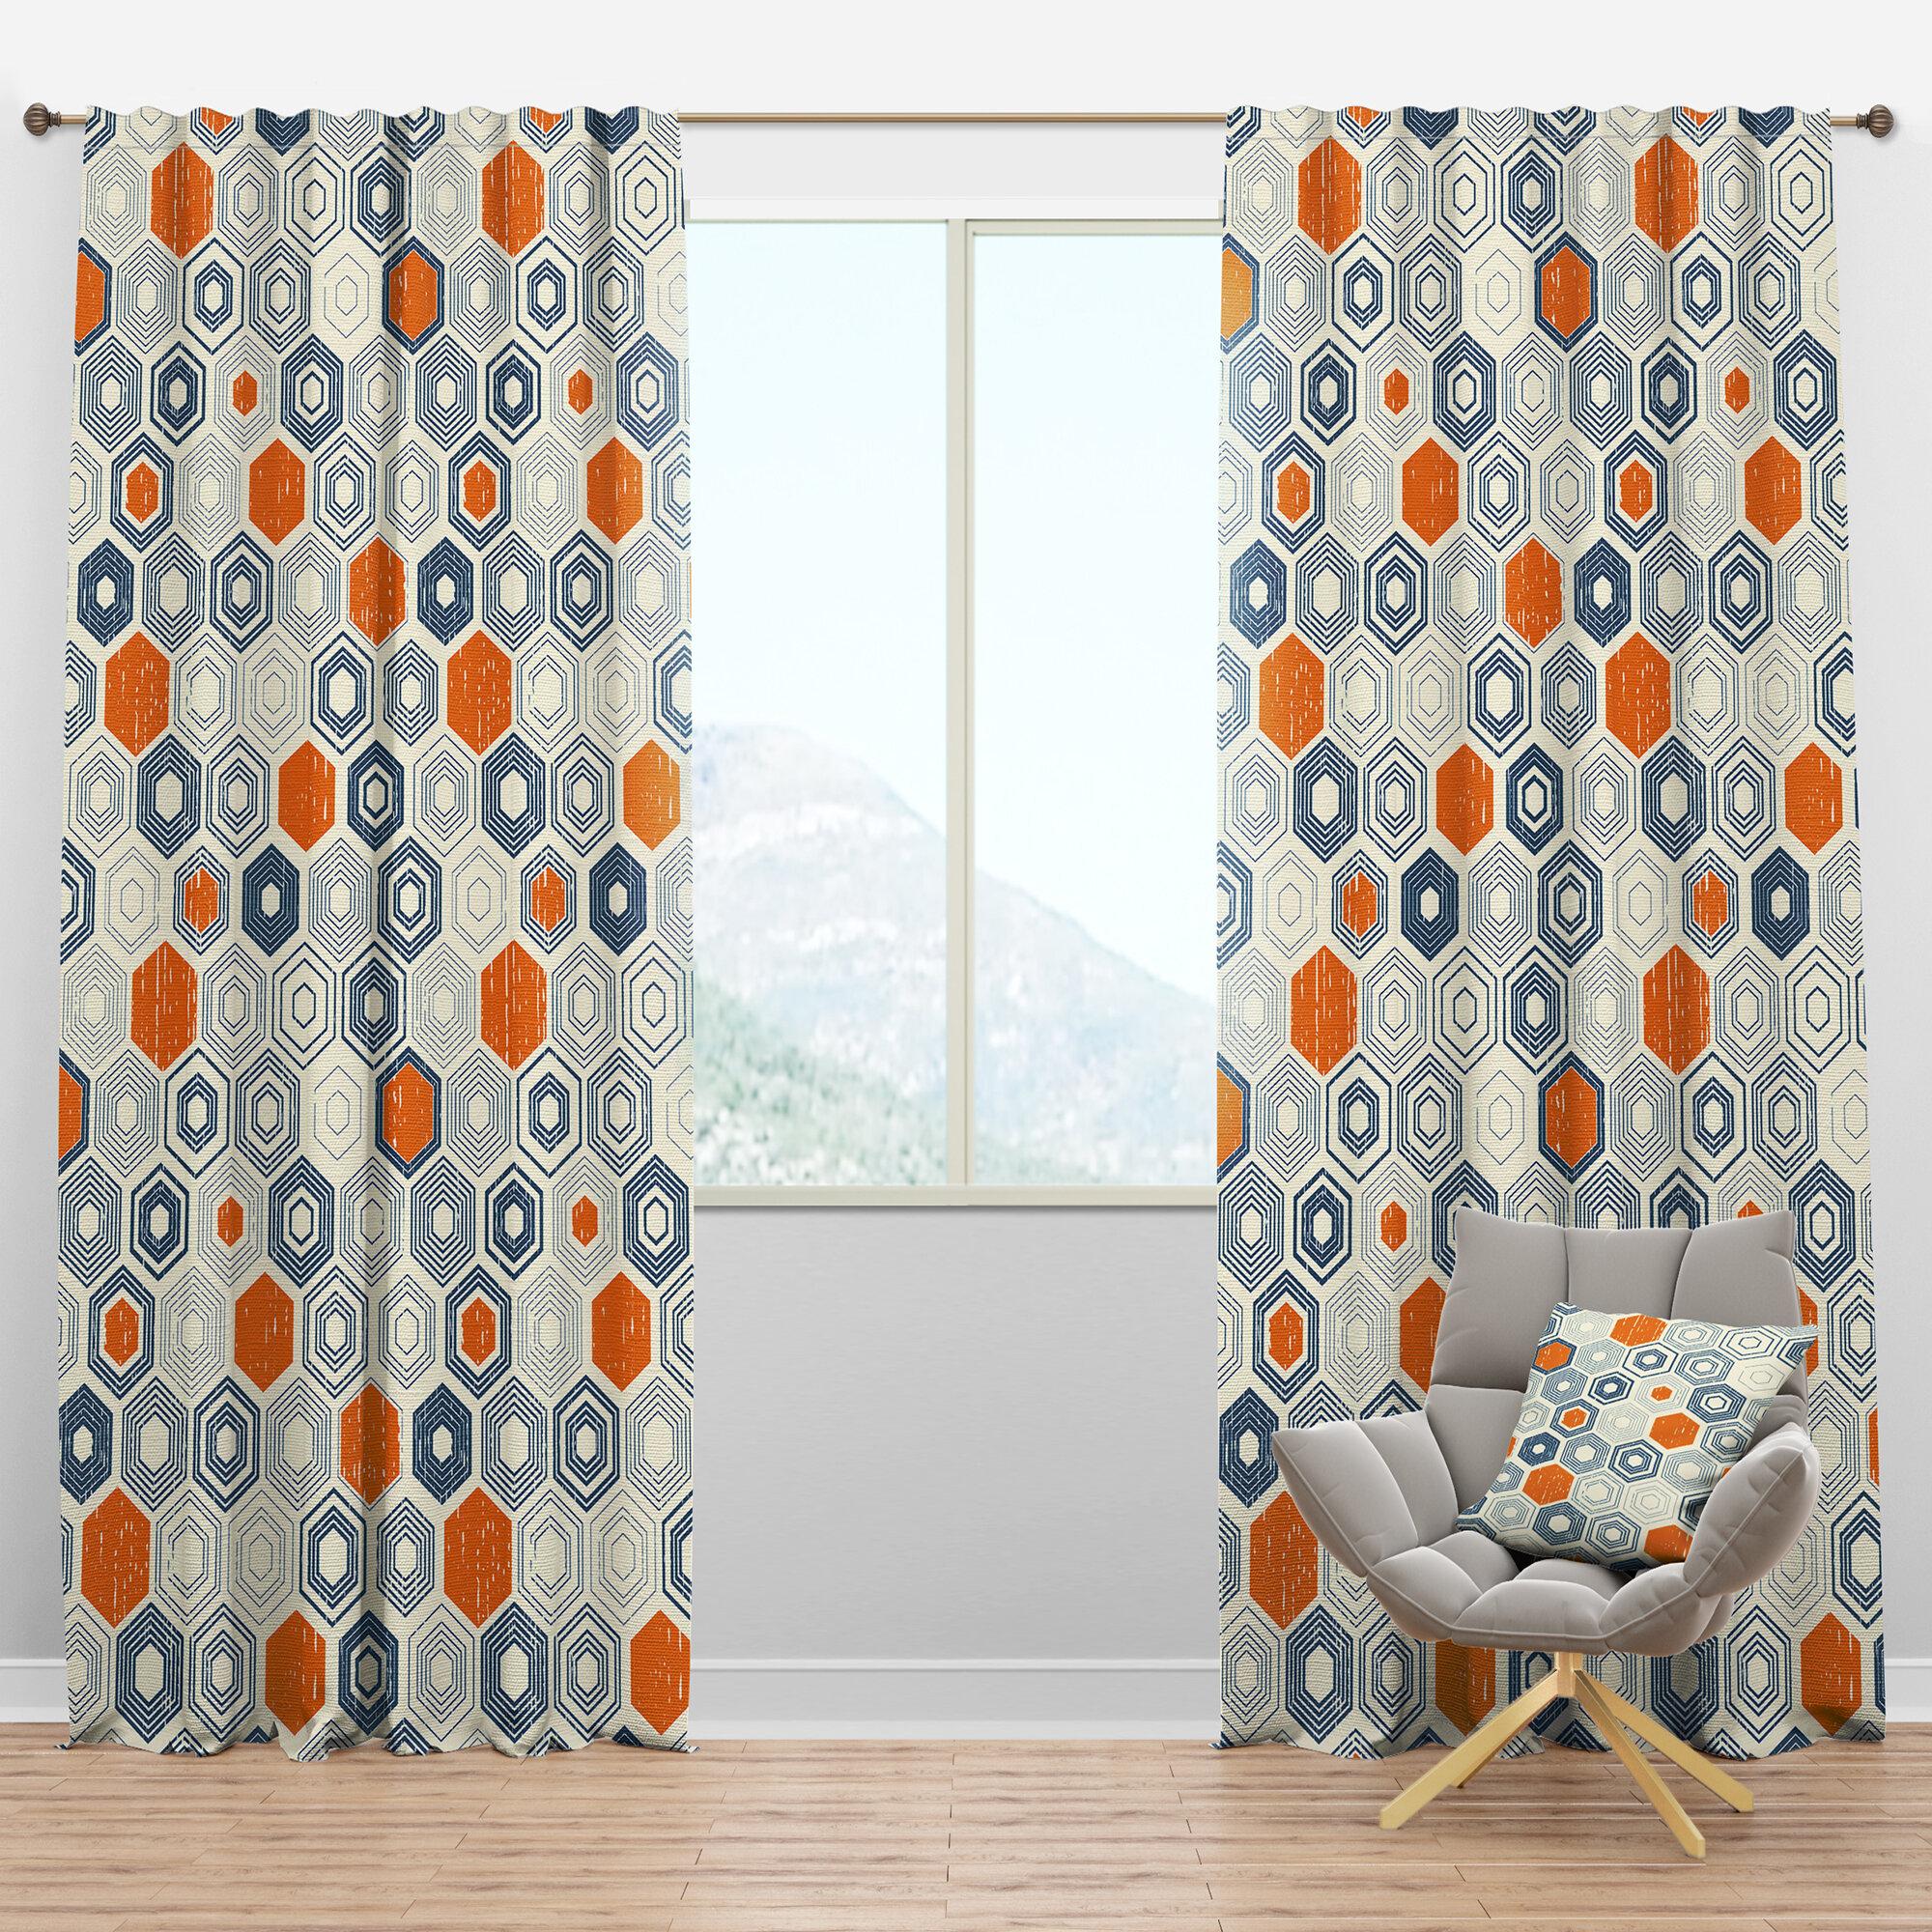 Designart Mid Century Hexagon Ix Geometric Semi Sheer Thermal Rod Pocket Single Curtain Panel Wayfair